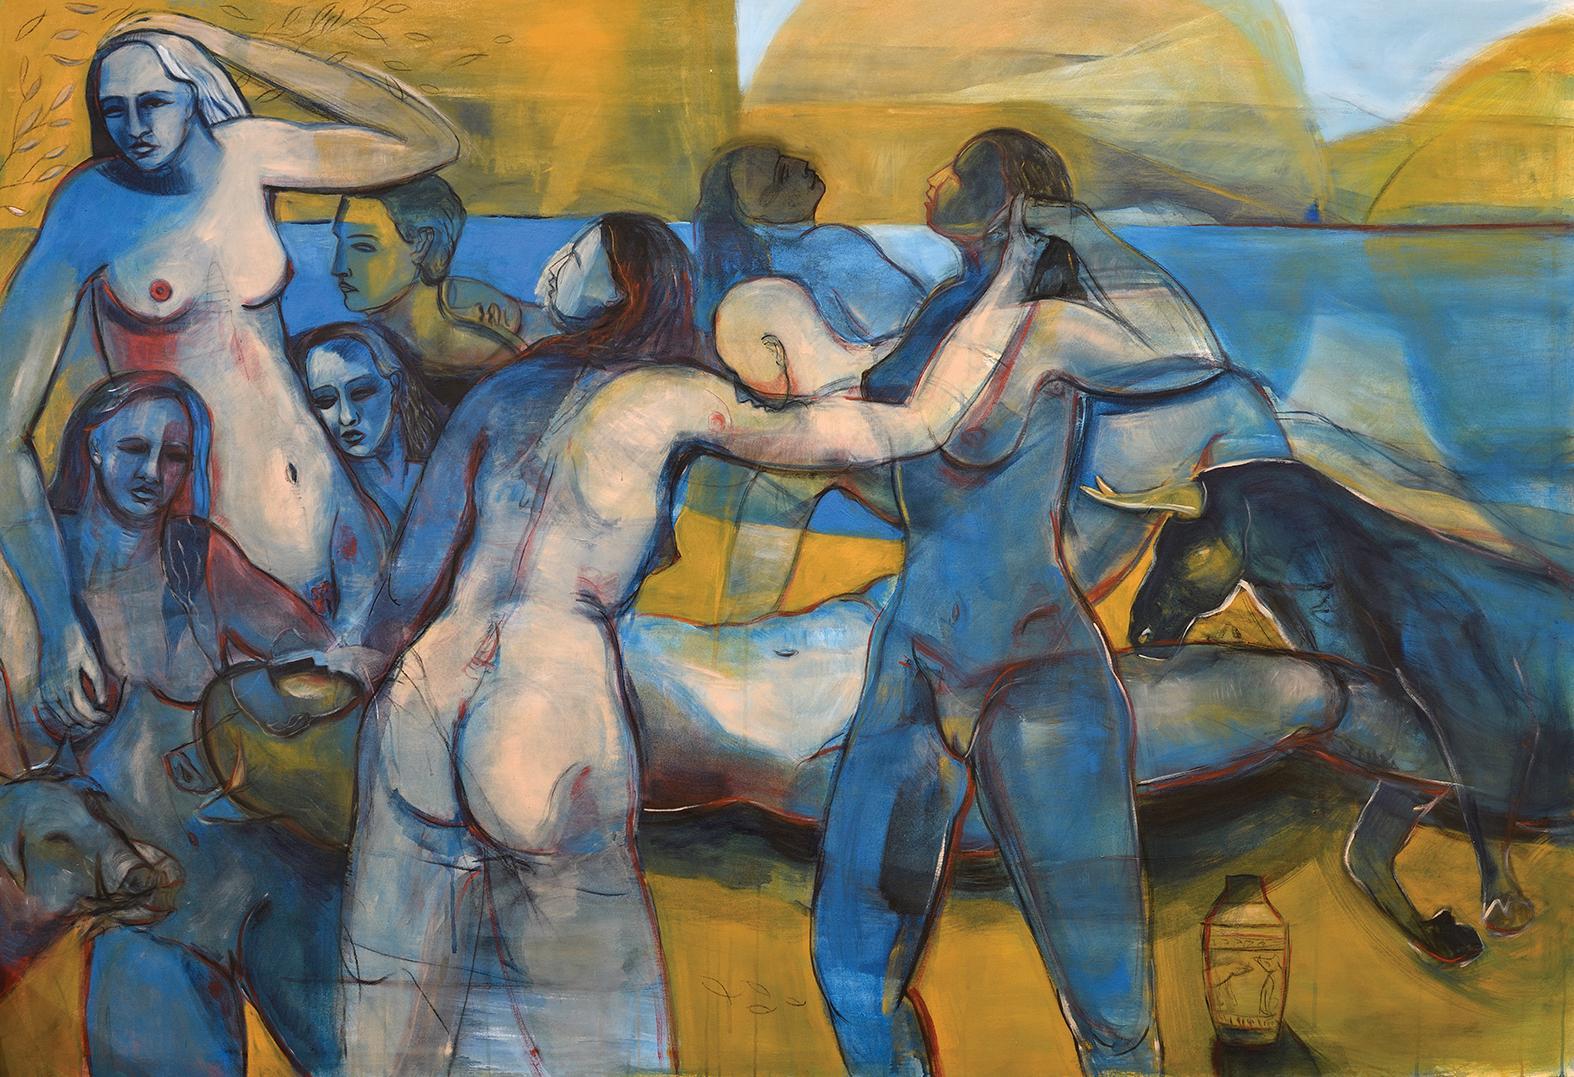 Circe and her Nymphs (2020), Gabriel Buttigieg